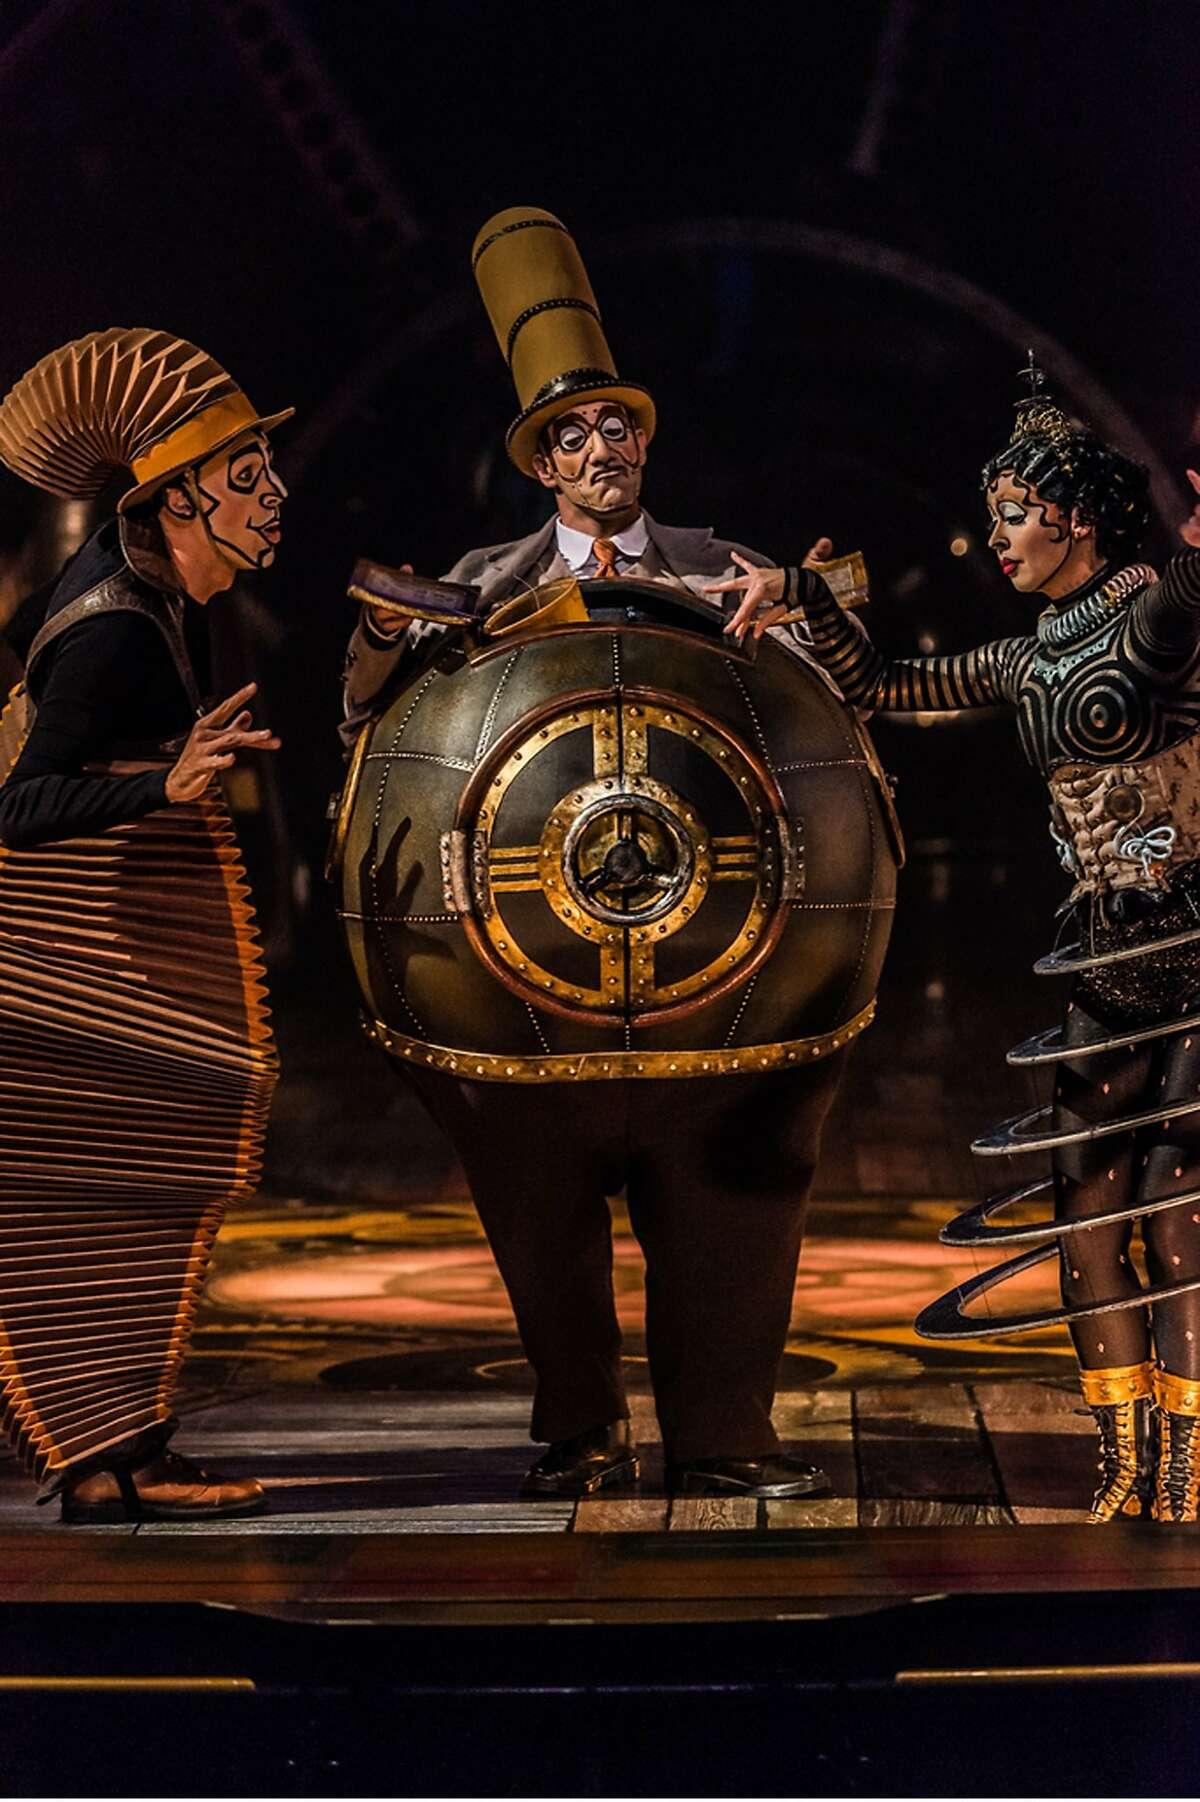 Nico the Accordion Man (Nicolas Baixas, left), Mr. Microcosmos (Karl L'Ecuyer) and Klara the Telegraph of the Invisible (Ekaterina Pirogovskaya) introduce us to the world of Curiosistan in Cirque du Soleil's